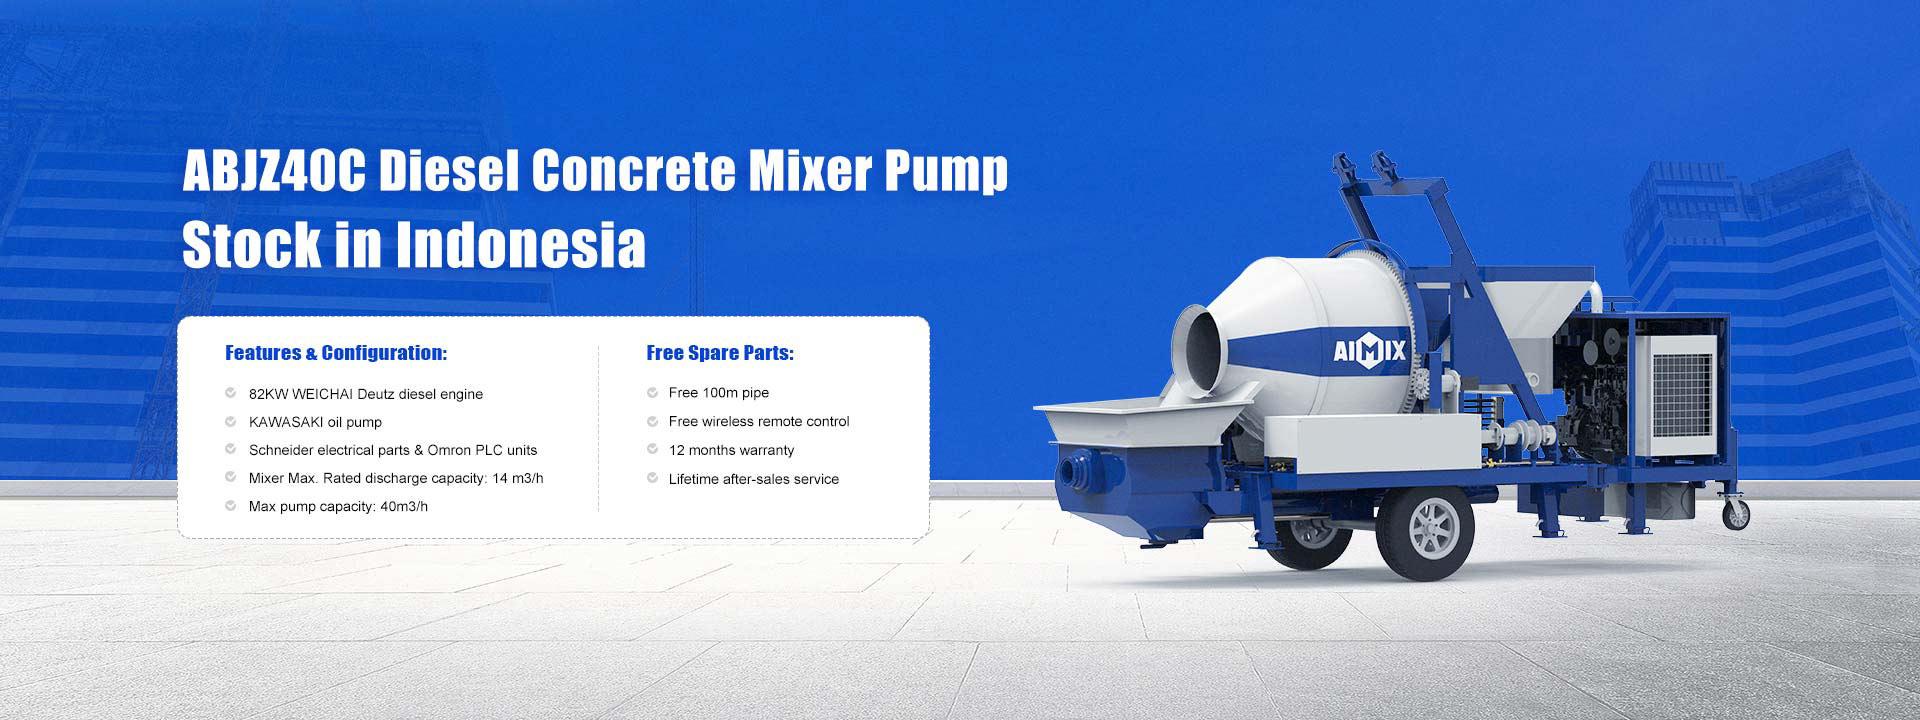 ABJZ40C Concrete Mixer Pump In Stock in Indonesia